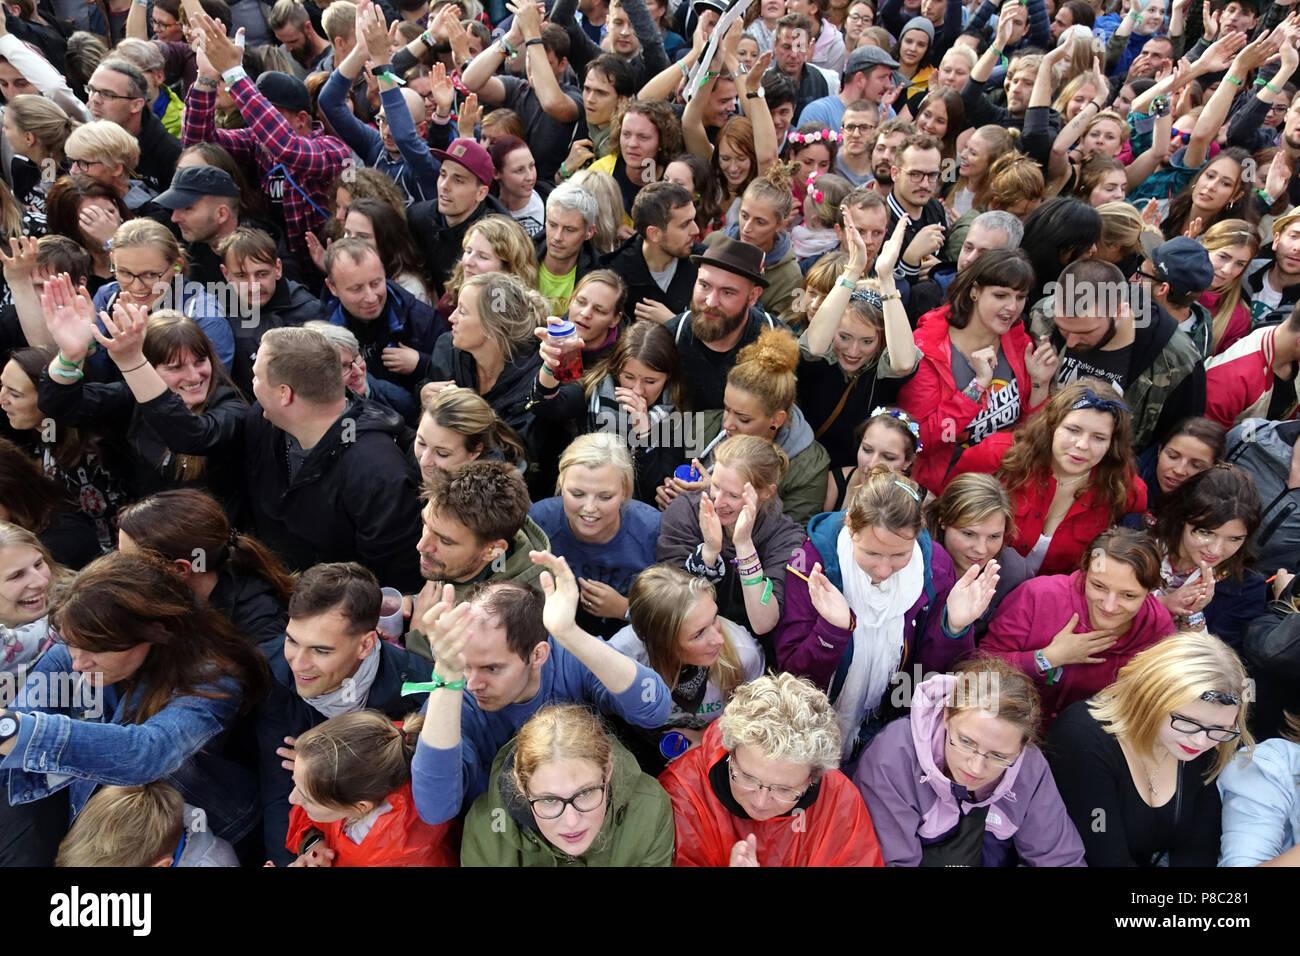 Hoppegarten, Germany, Crowd at Lollapalooza Berlin 2017 at the racecourse Hoppegarten - Stock Image